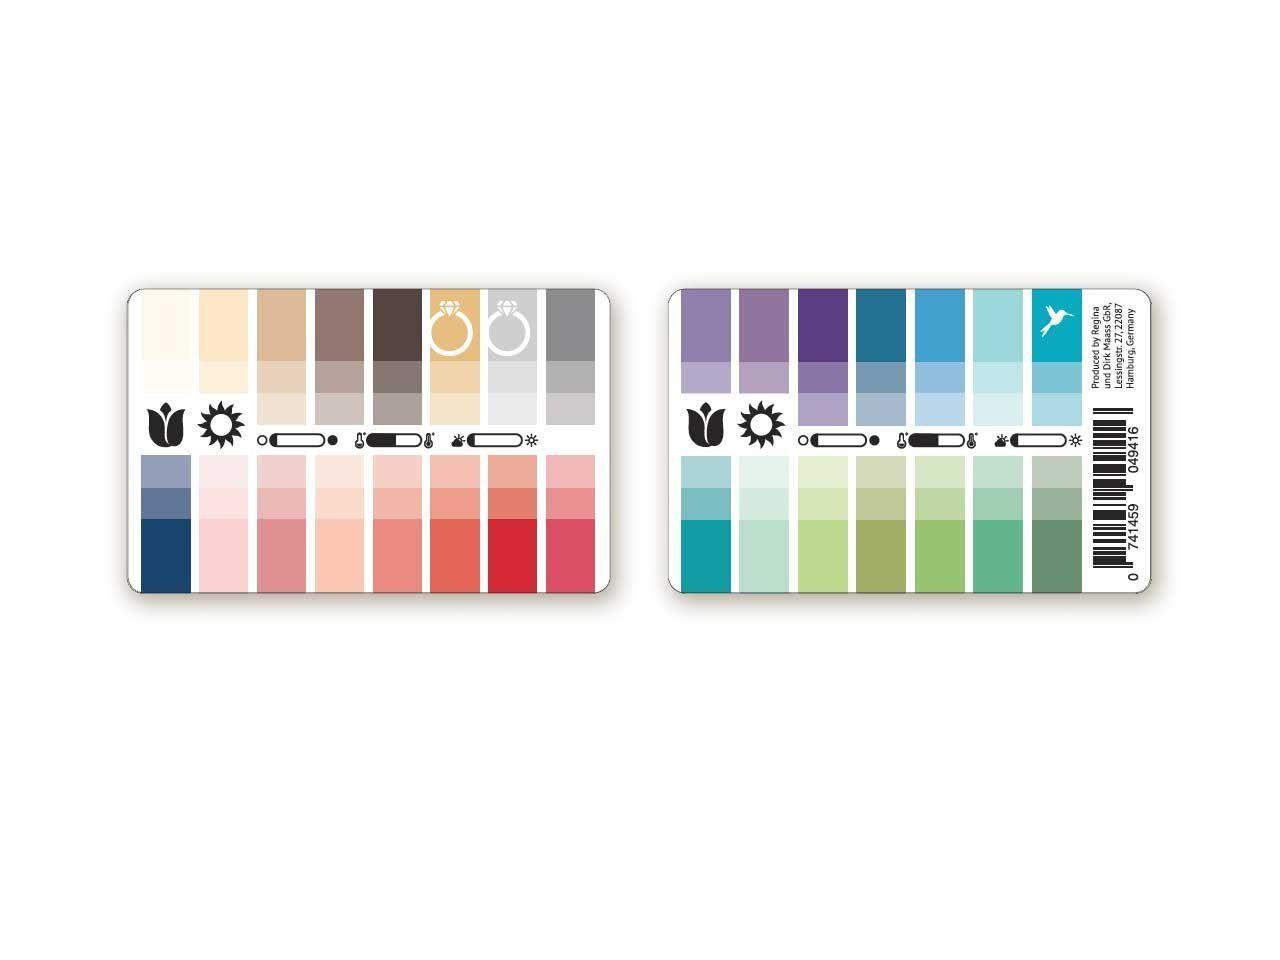 Amazon plastic card colour chart light spring with 30 colors amazon plastic card colour chart light spring with 30 colors for color analysis nvjuhfo Gallery